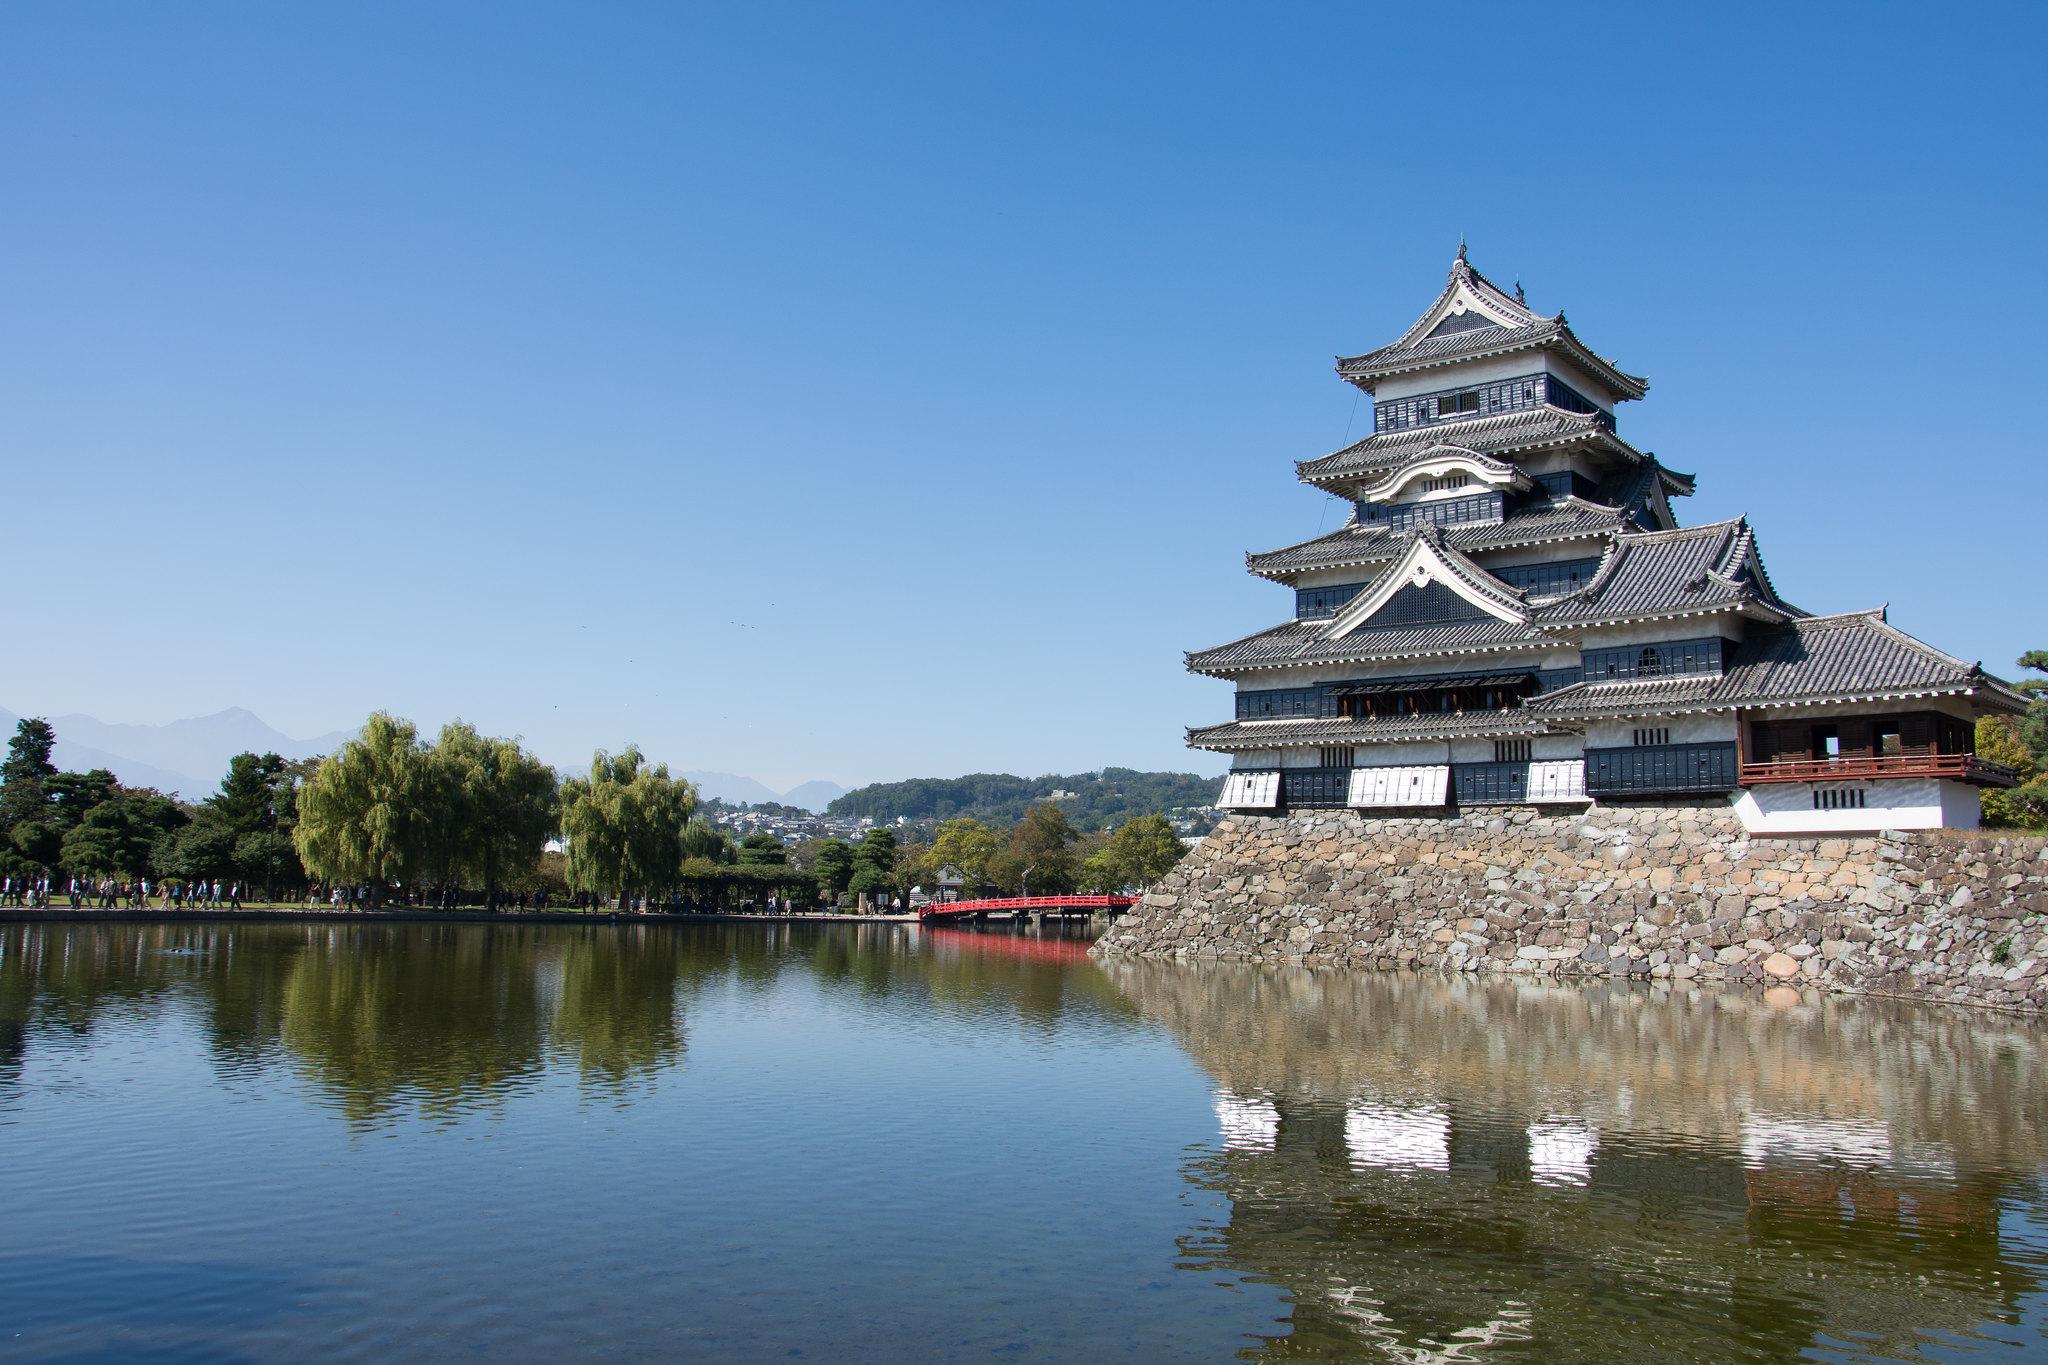 matsumoto castello